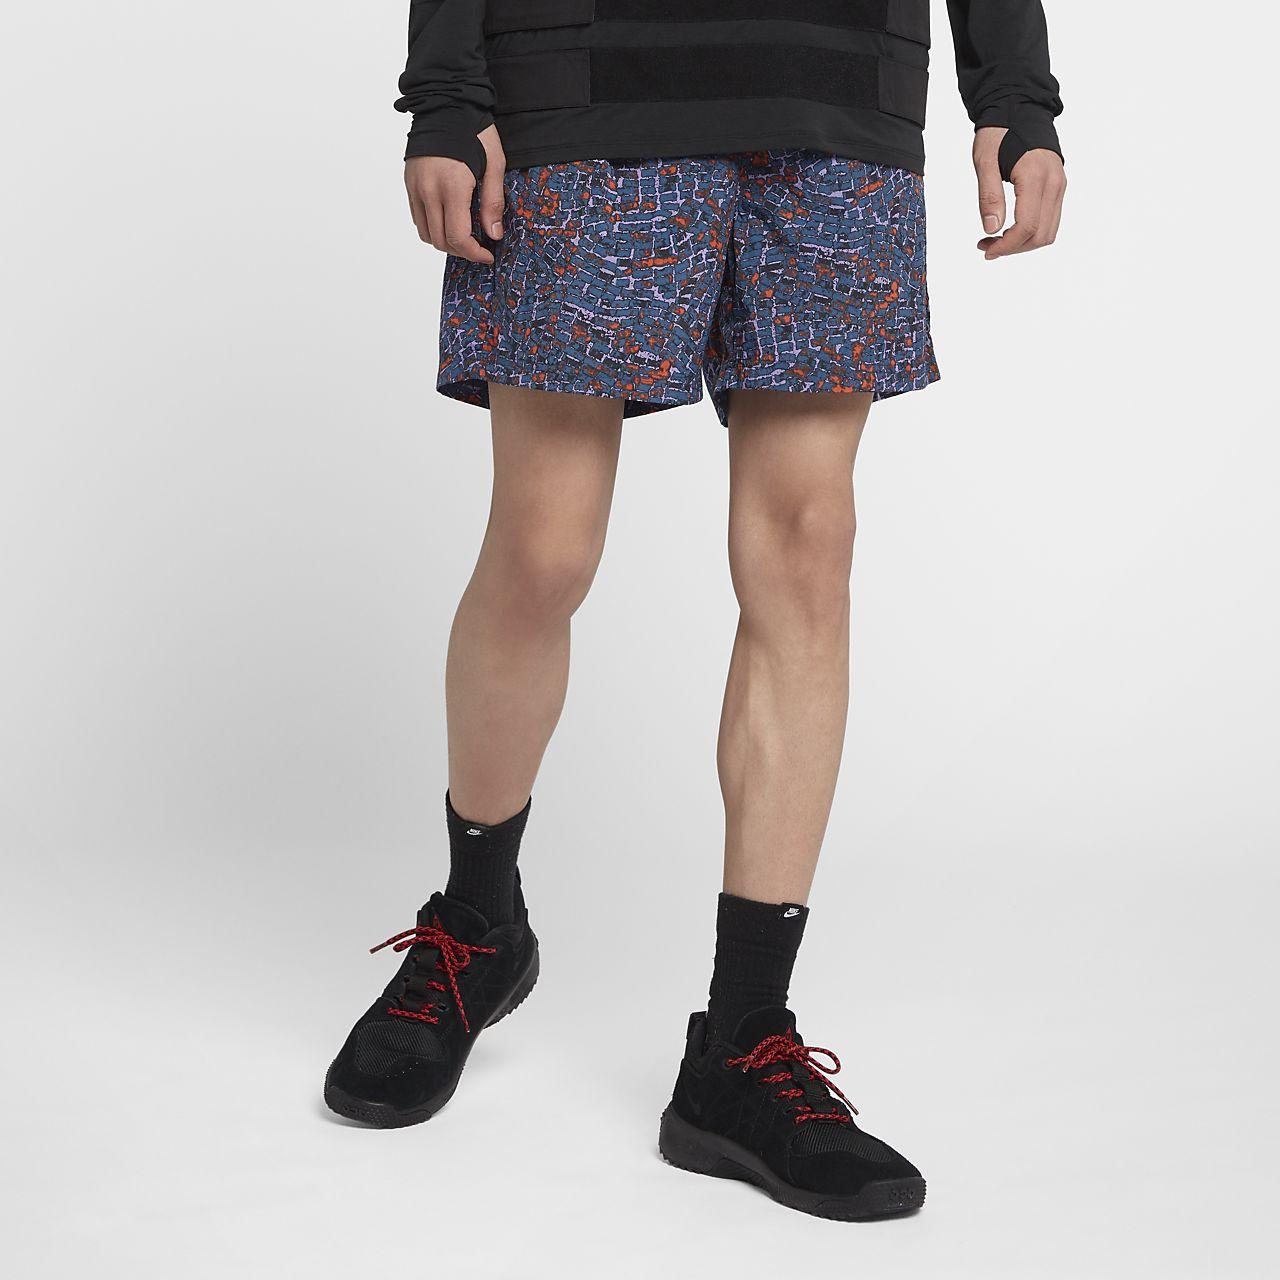 Nike ACG Men's Shorts